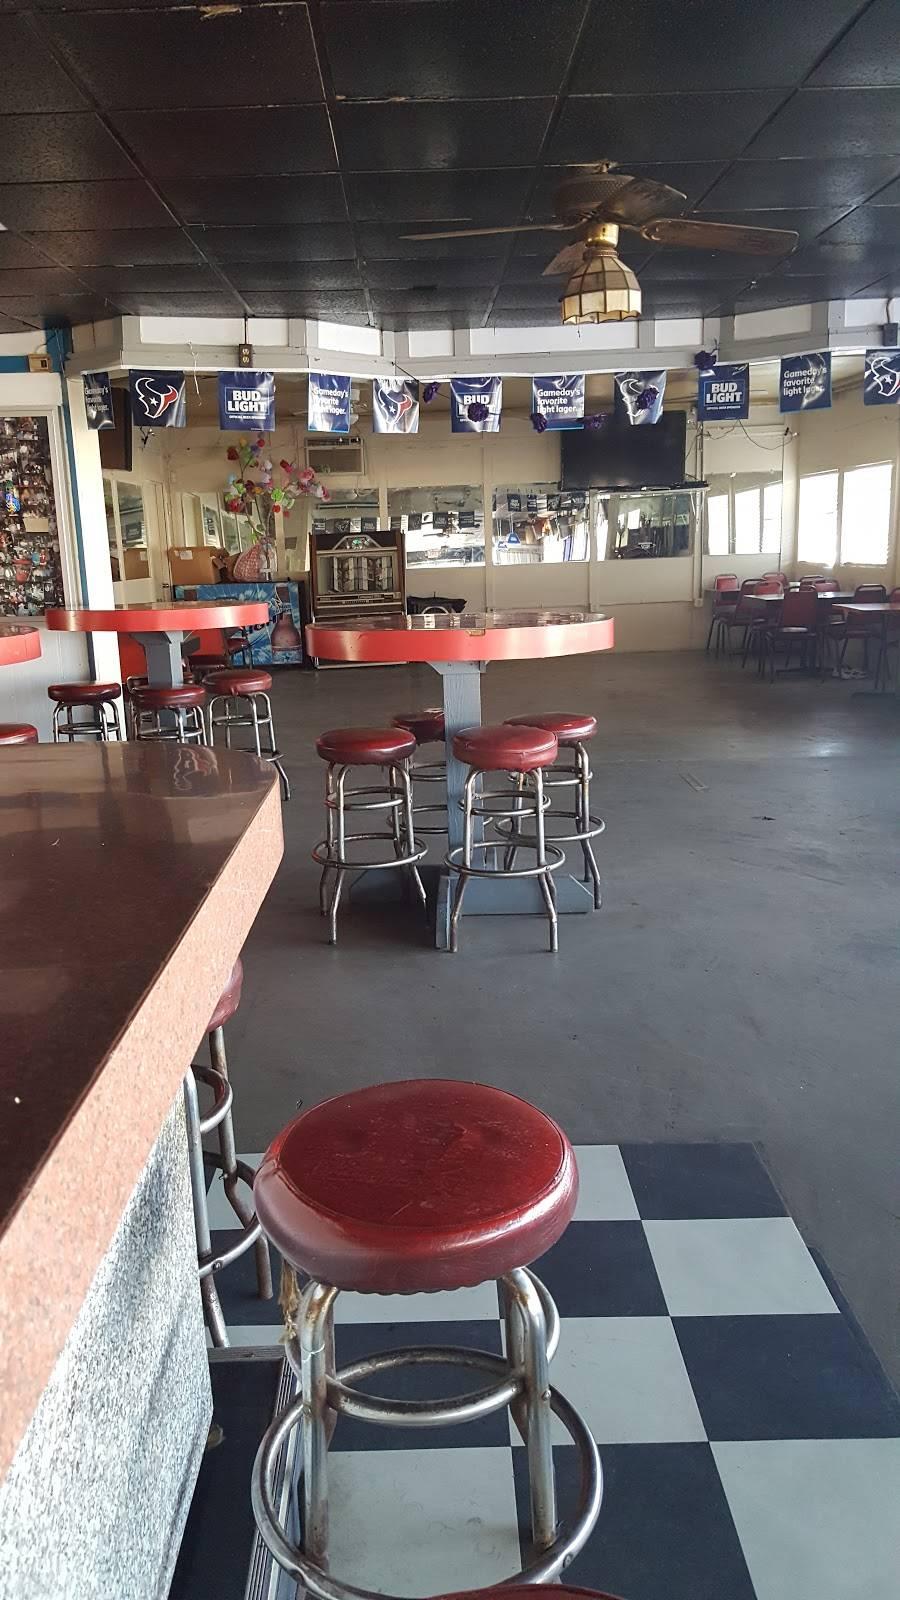 Harrisburg Country Club | restaurant | 3618 Harrisburg Blvd, Houston, TX 77003, USA | 7132378526 OR +1 713-237-8526